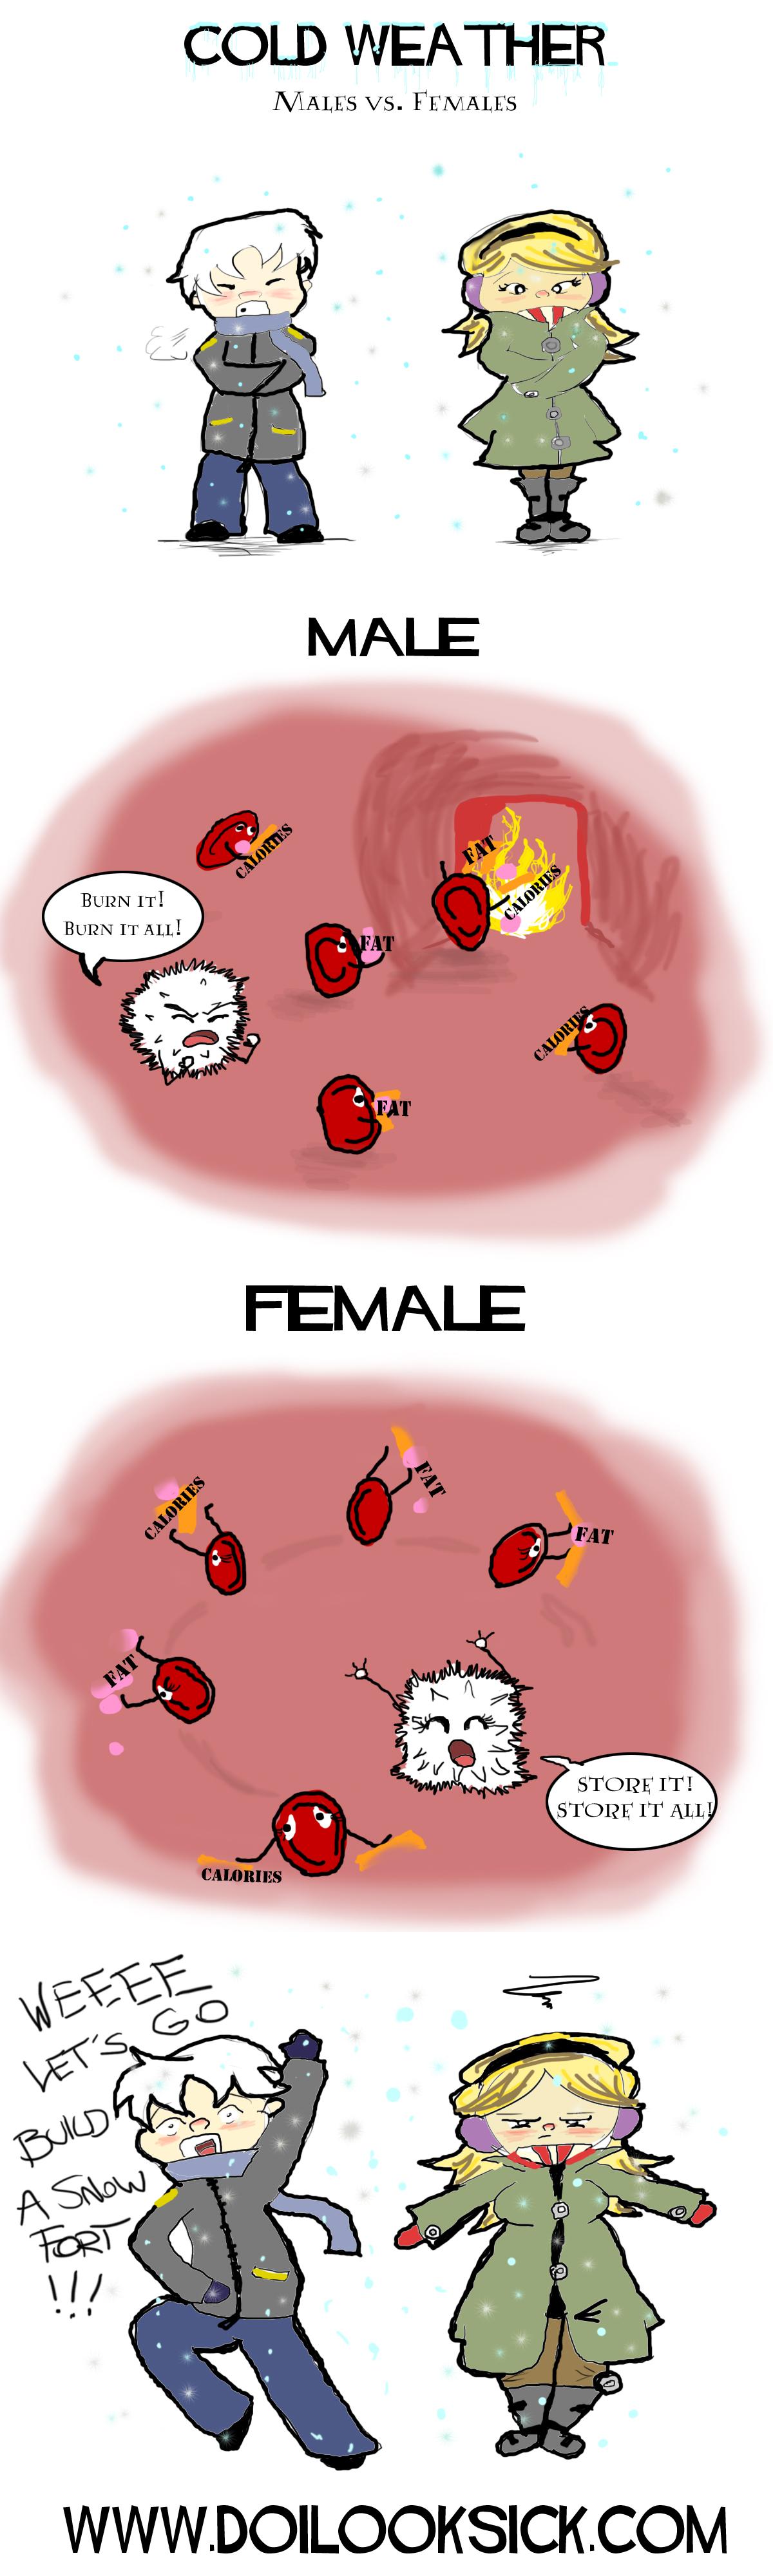 men women male female cold weather anatomy winter